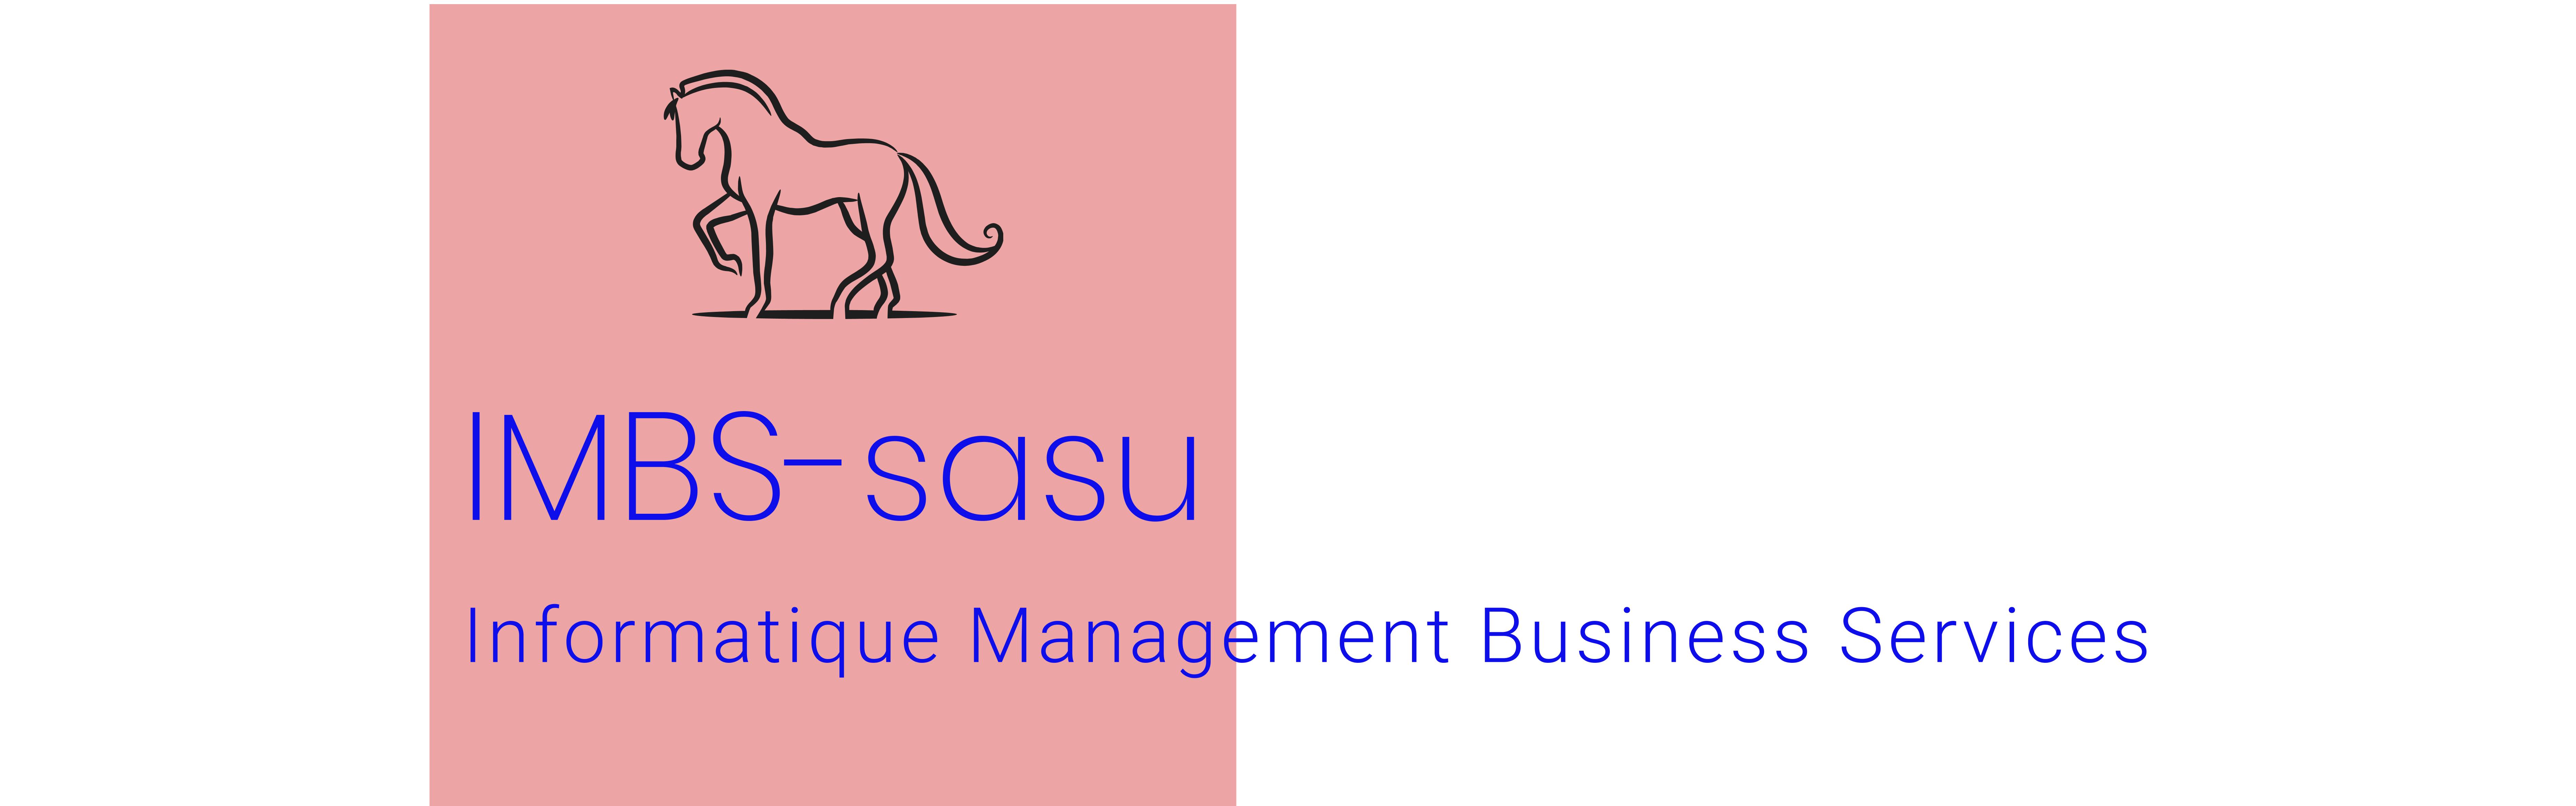 IMBS-SASU